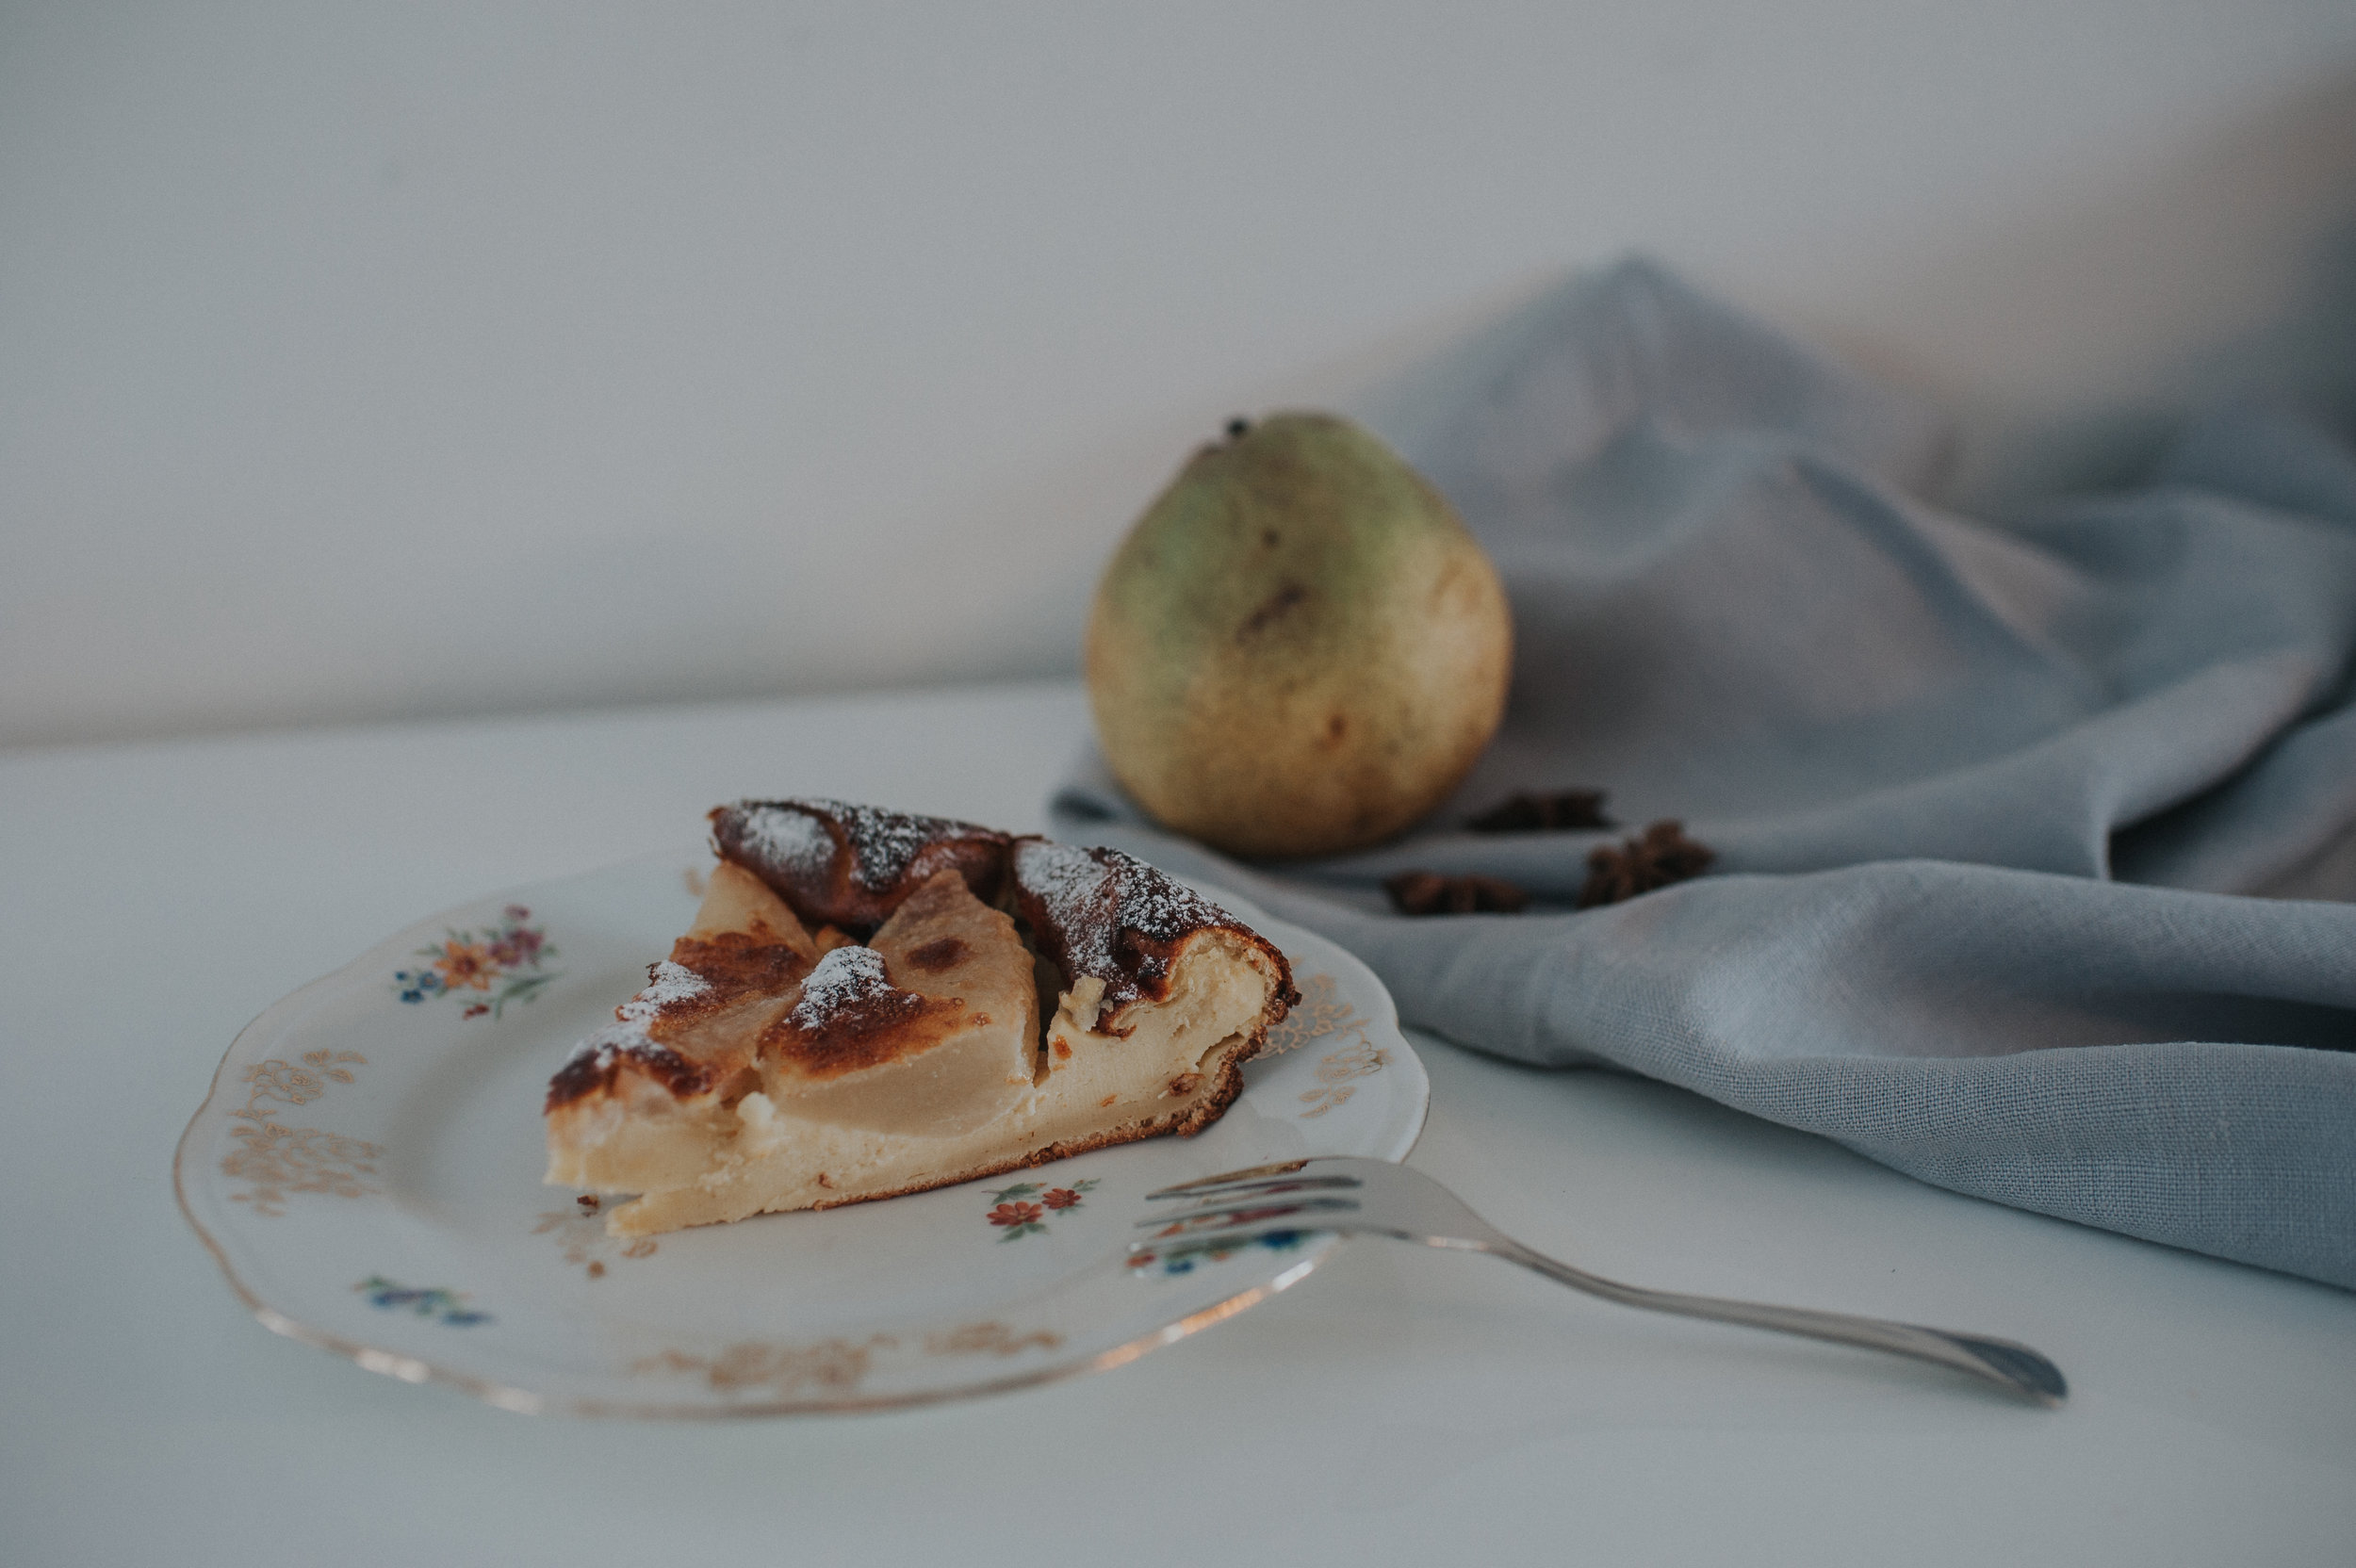 photographe-culinaire-grenoble.jpg